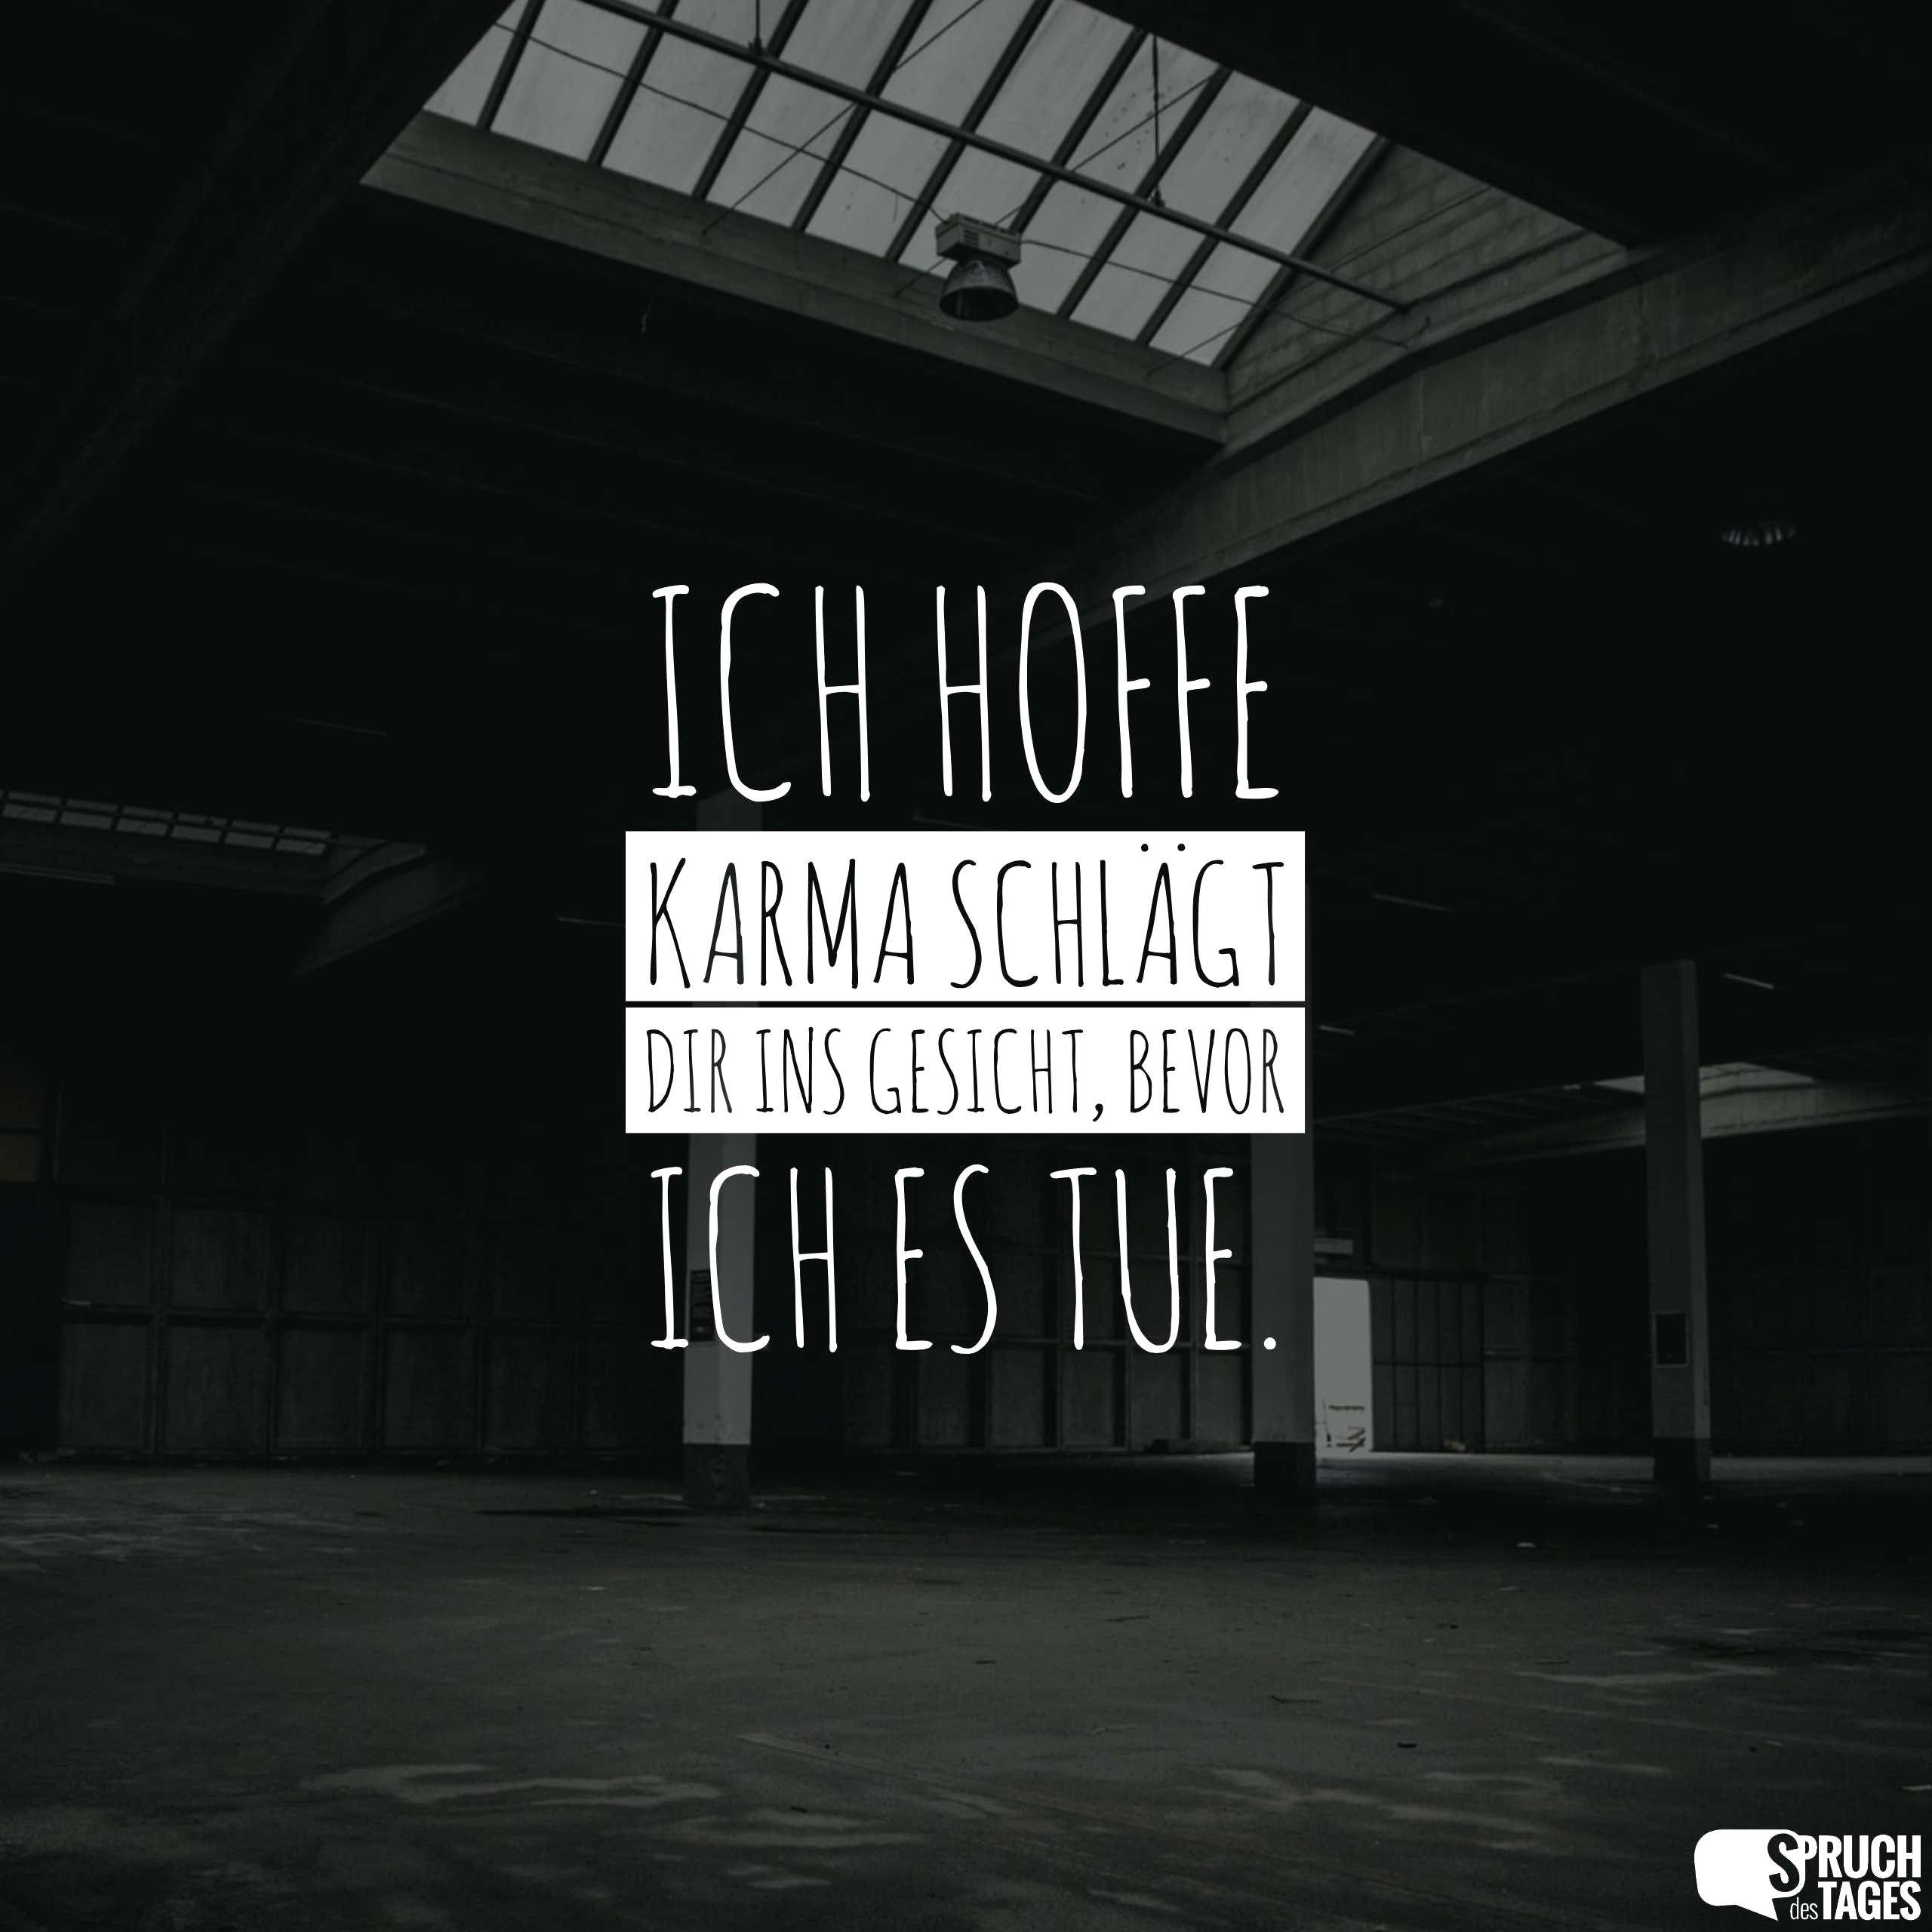 Zitate Lustig Kurz | Karma sprüche, Witzige sprüche